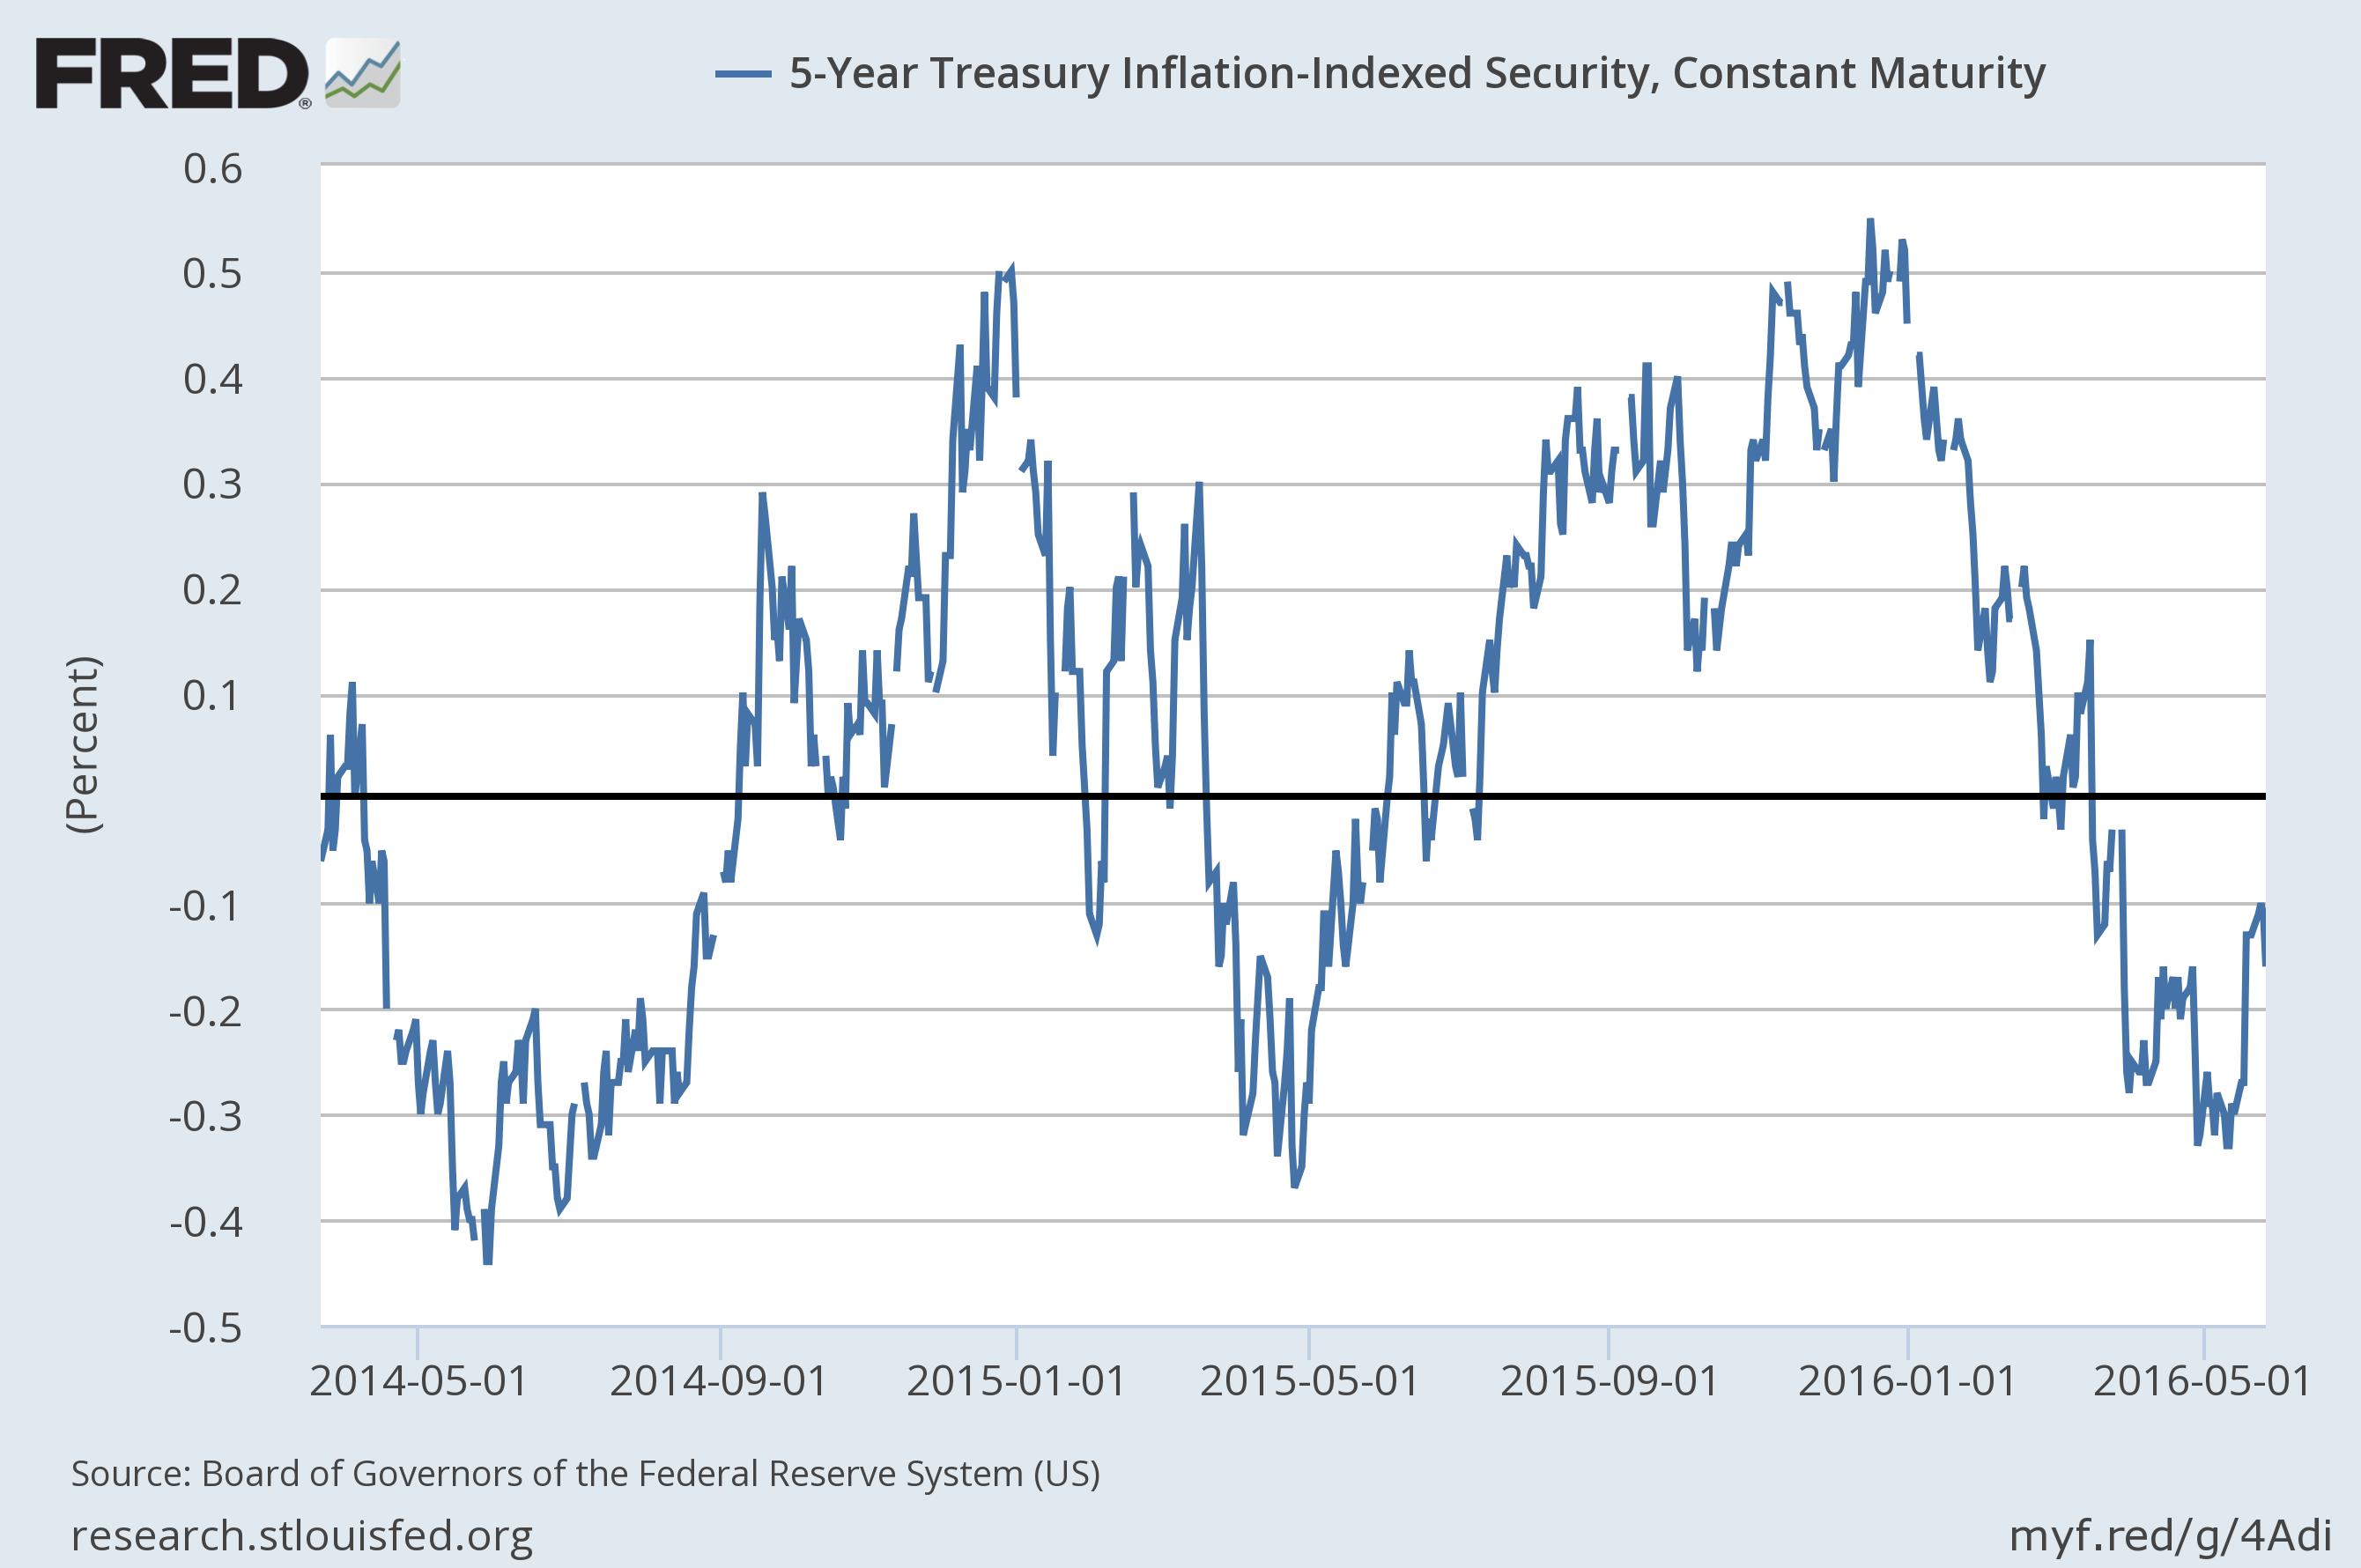 5 year tips yield